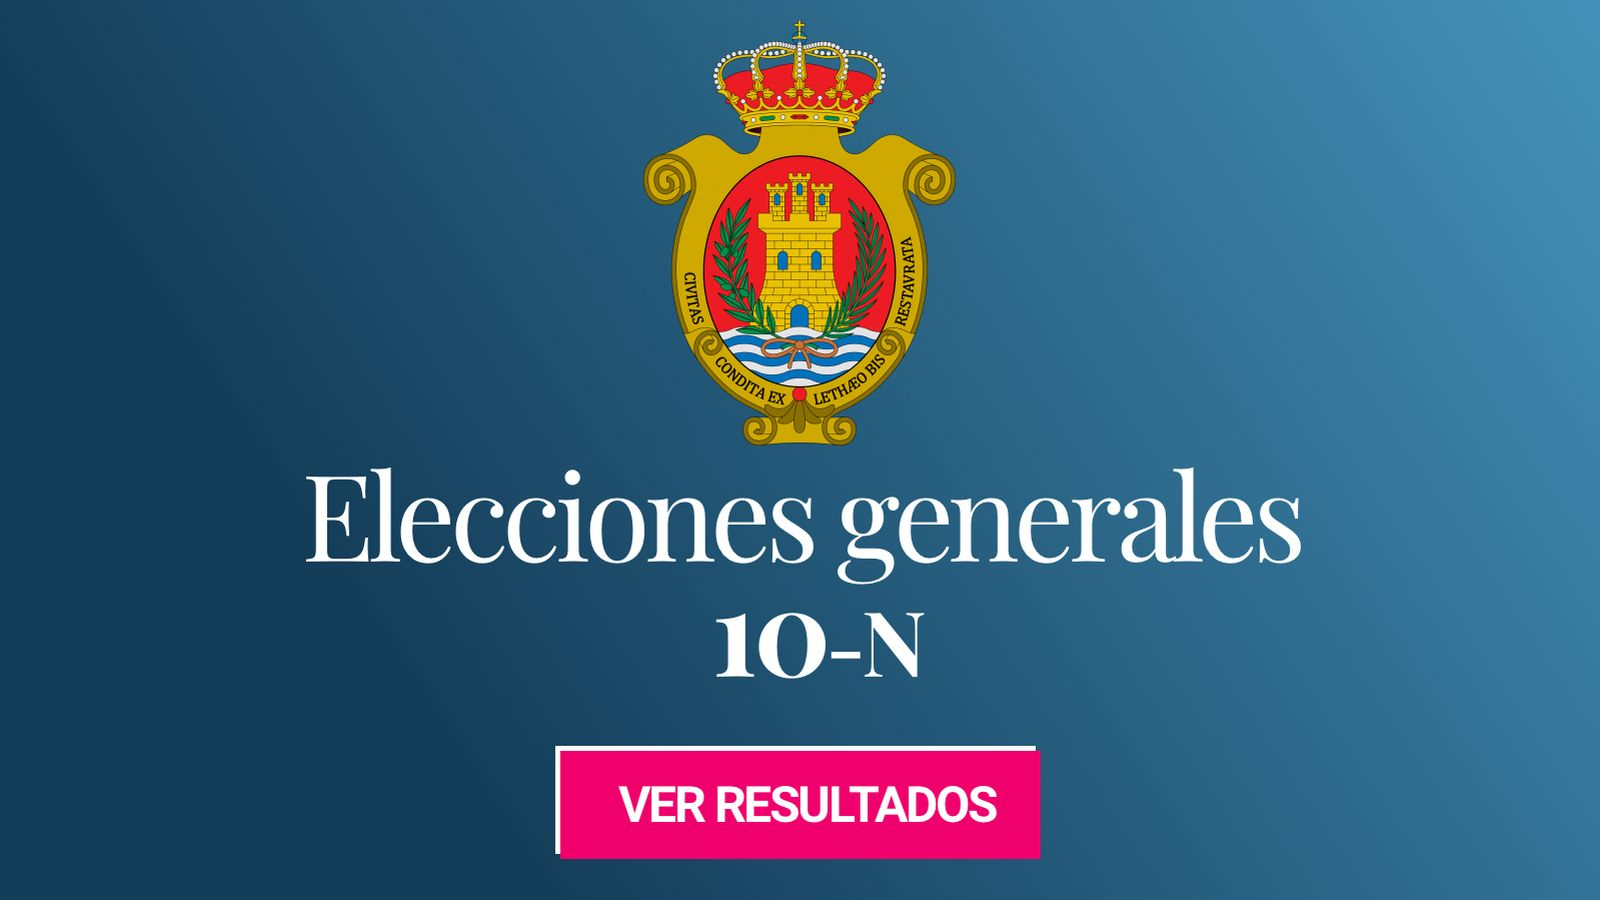 Foto: Elecciones generales 2019 en Algeciras. (C.C./EC)